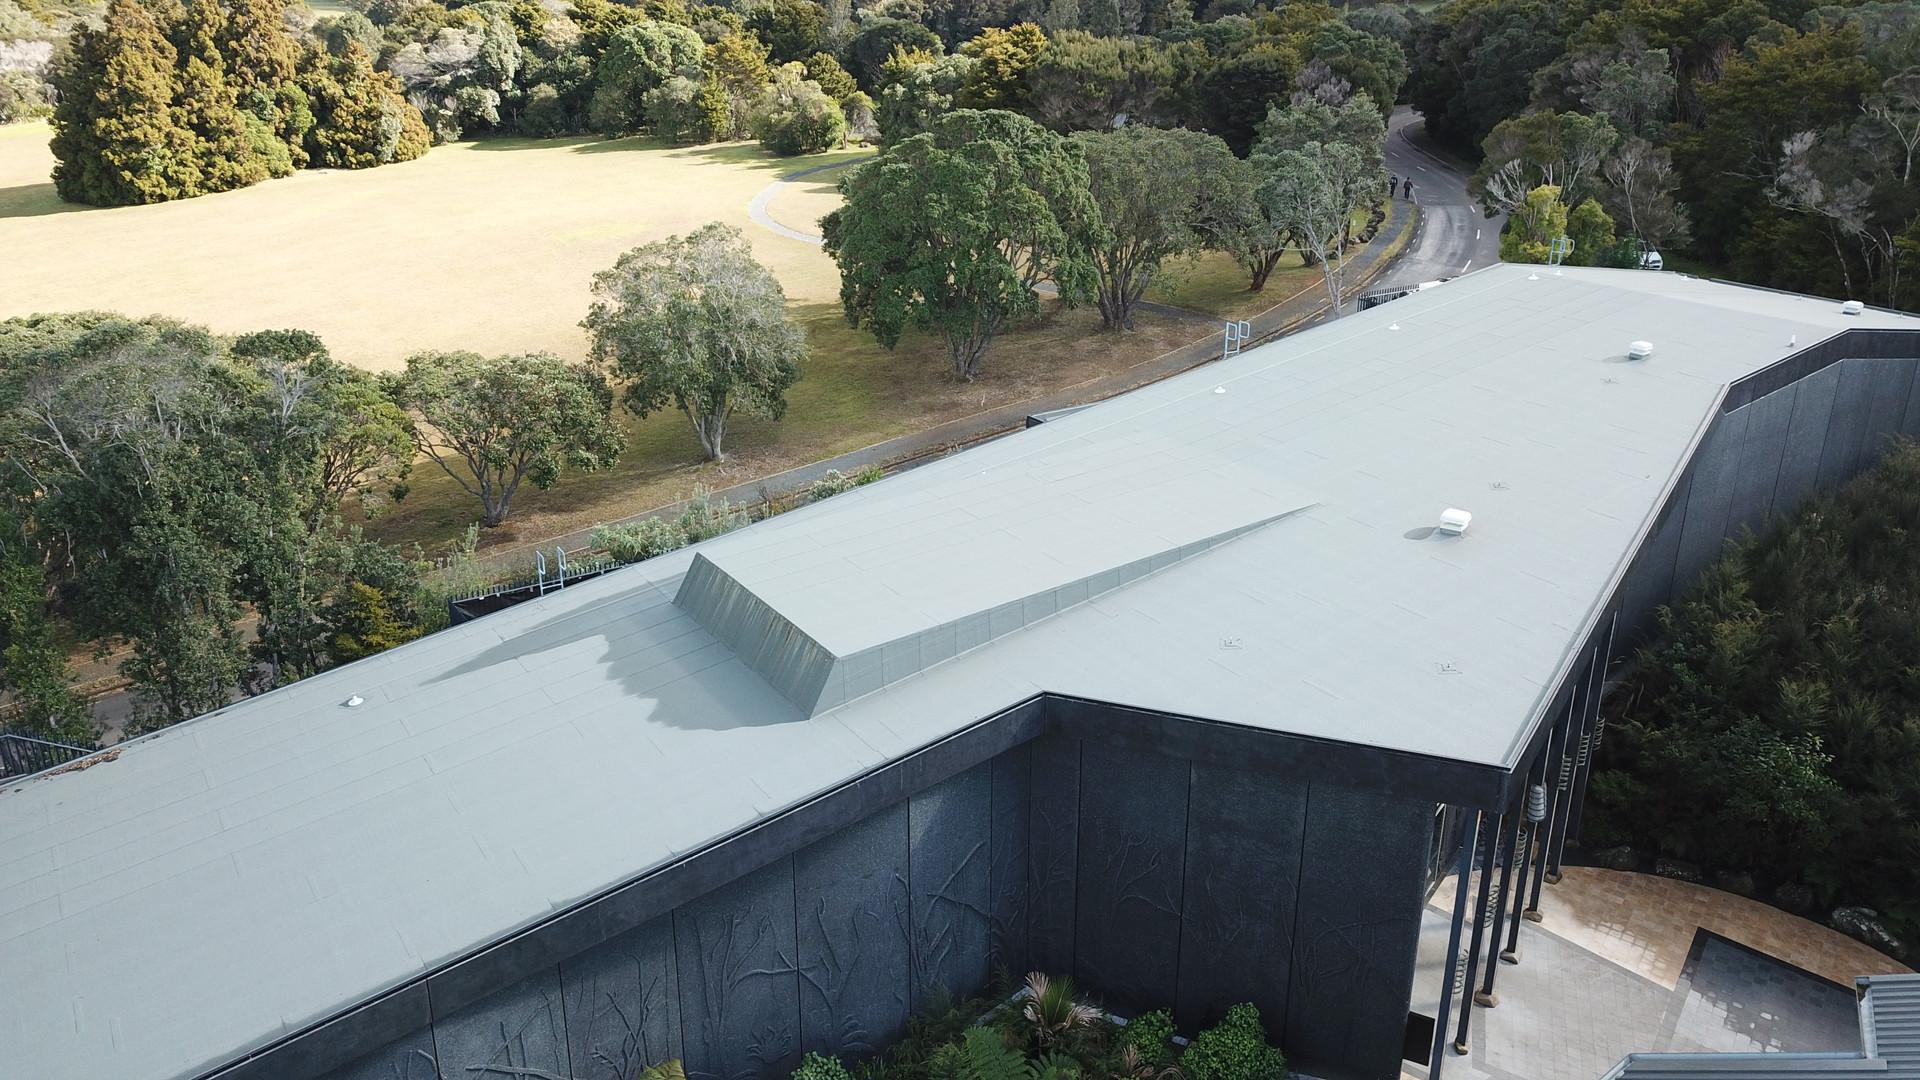 Waitangi Drone 1.JPG